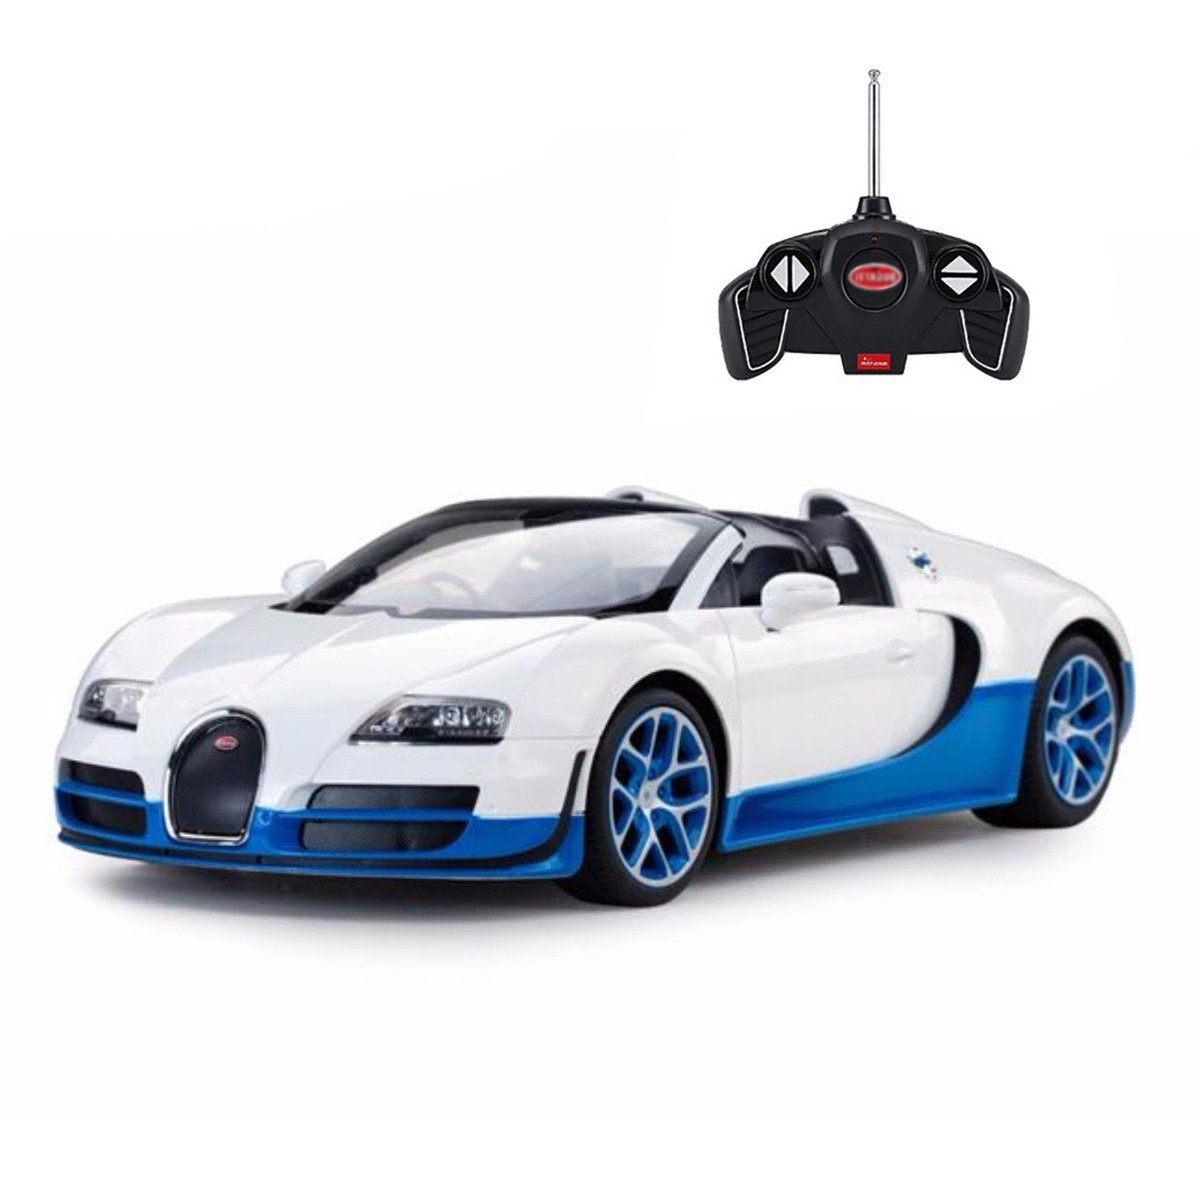 Masina cu telecomanda Rastar Bugatti Veyron Grand Sport Vitesse, 1:18, Alb